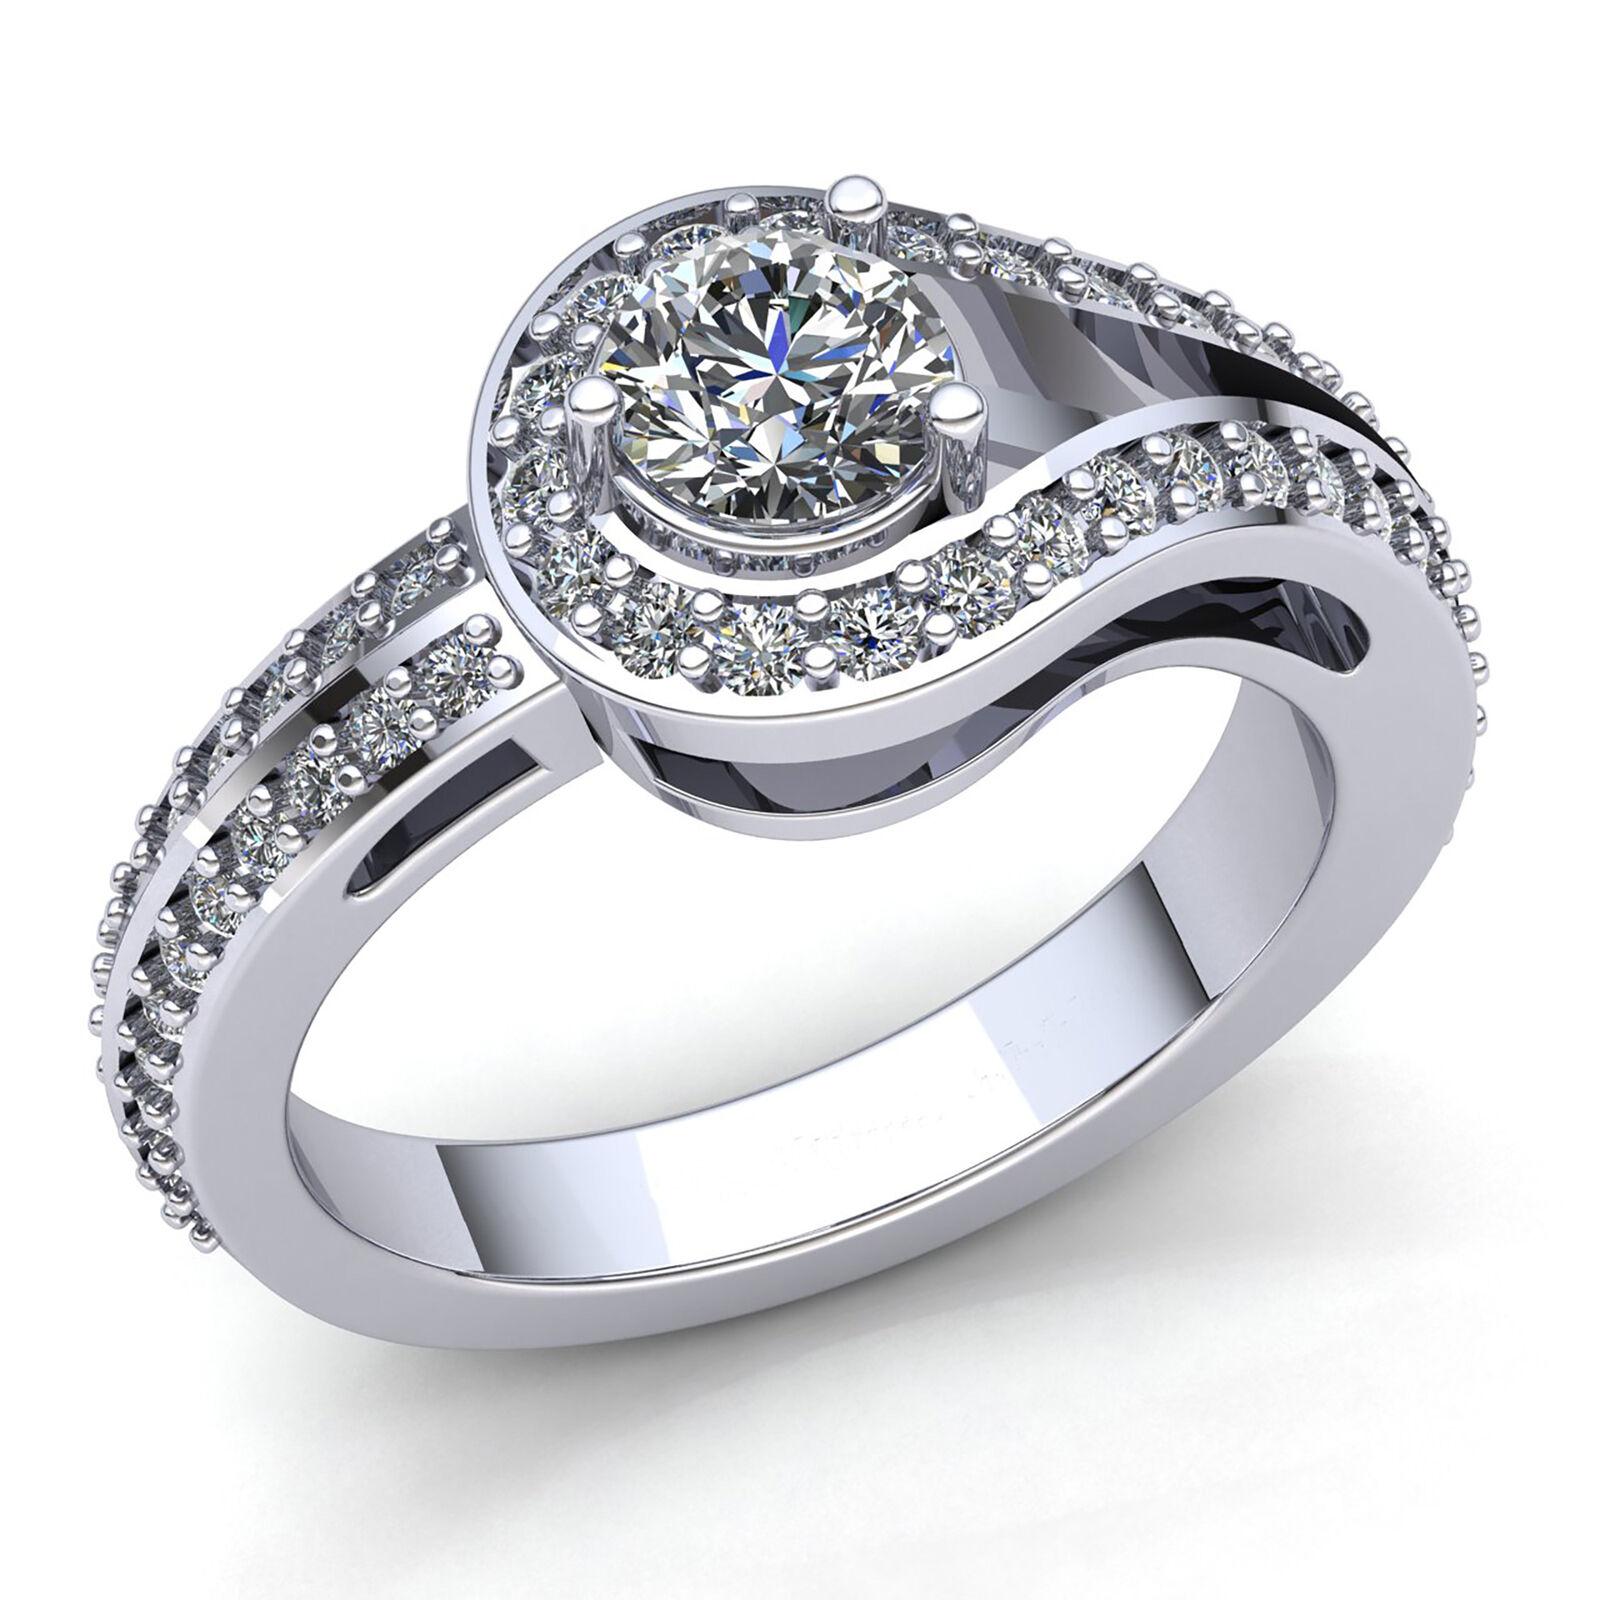 Genuine 1ctw Round Cut Diamond Ladies Accent Solitaire Engagement Ring 10K gold